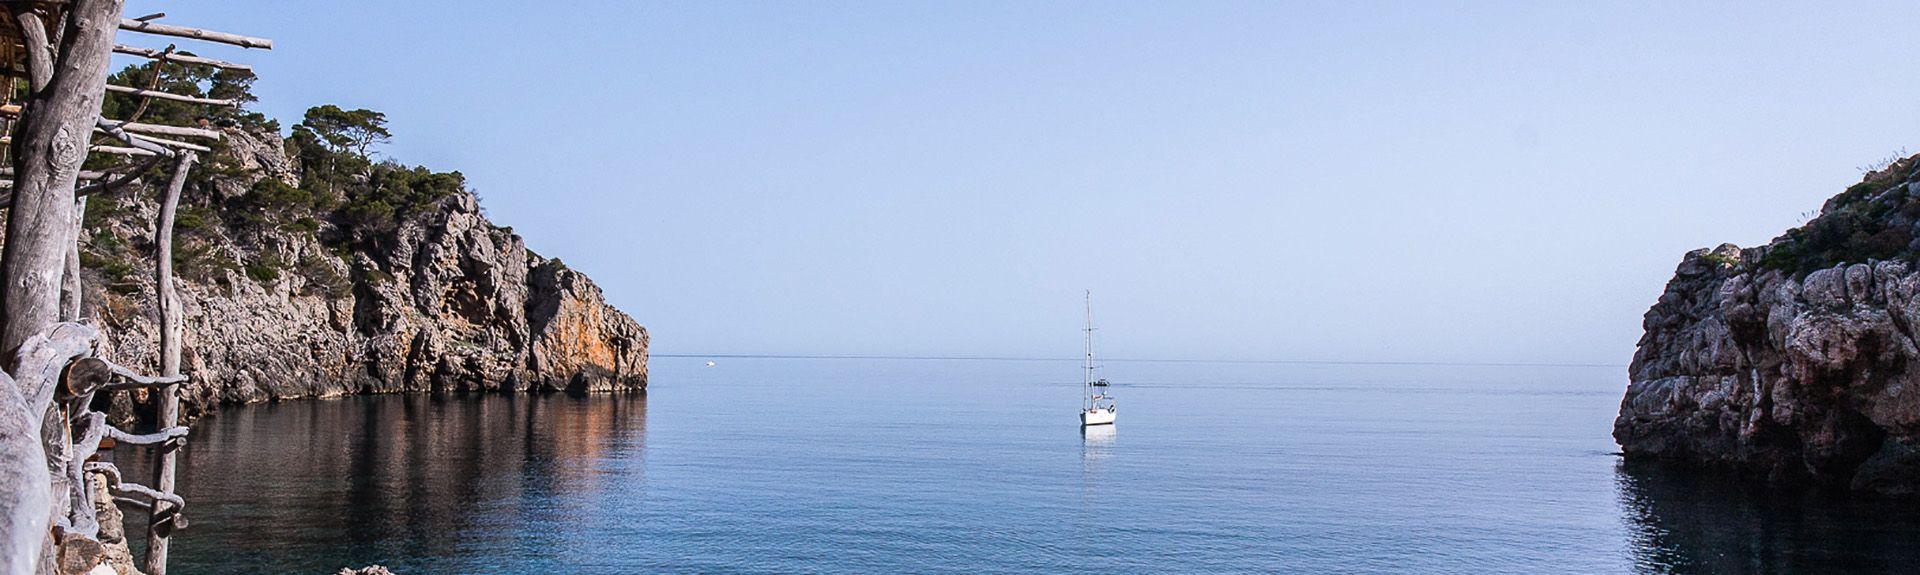 Cala Banyalbufar, Banyalbufar, Baleariske Øer, Spanien